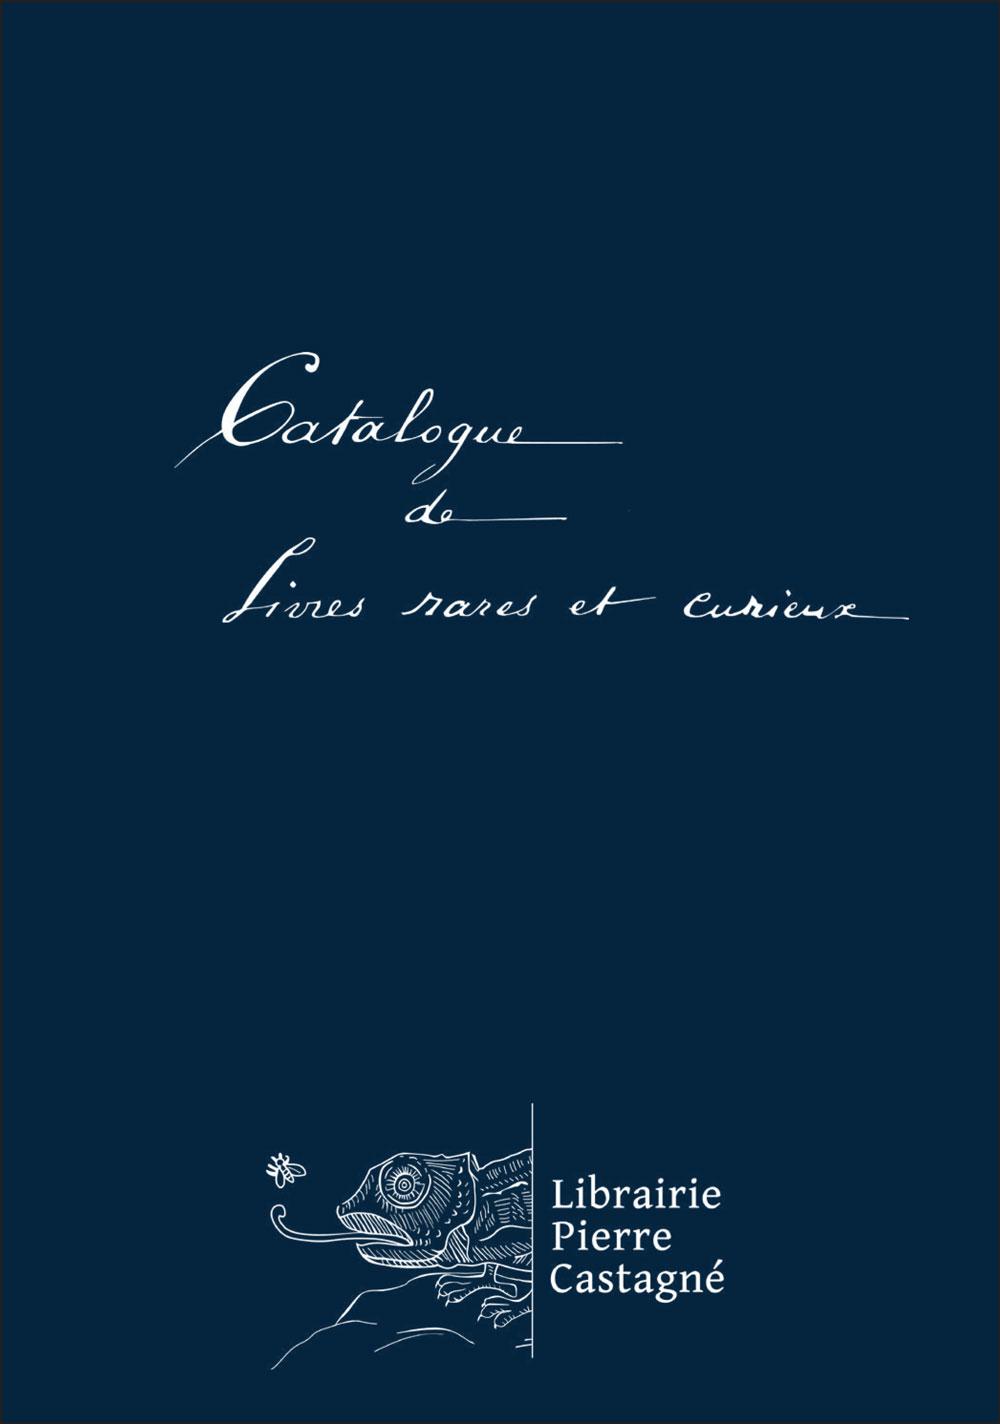 20 Catalogue de livres rares et curieux I